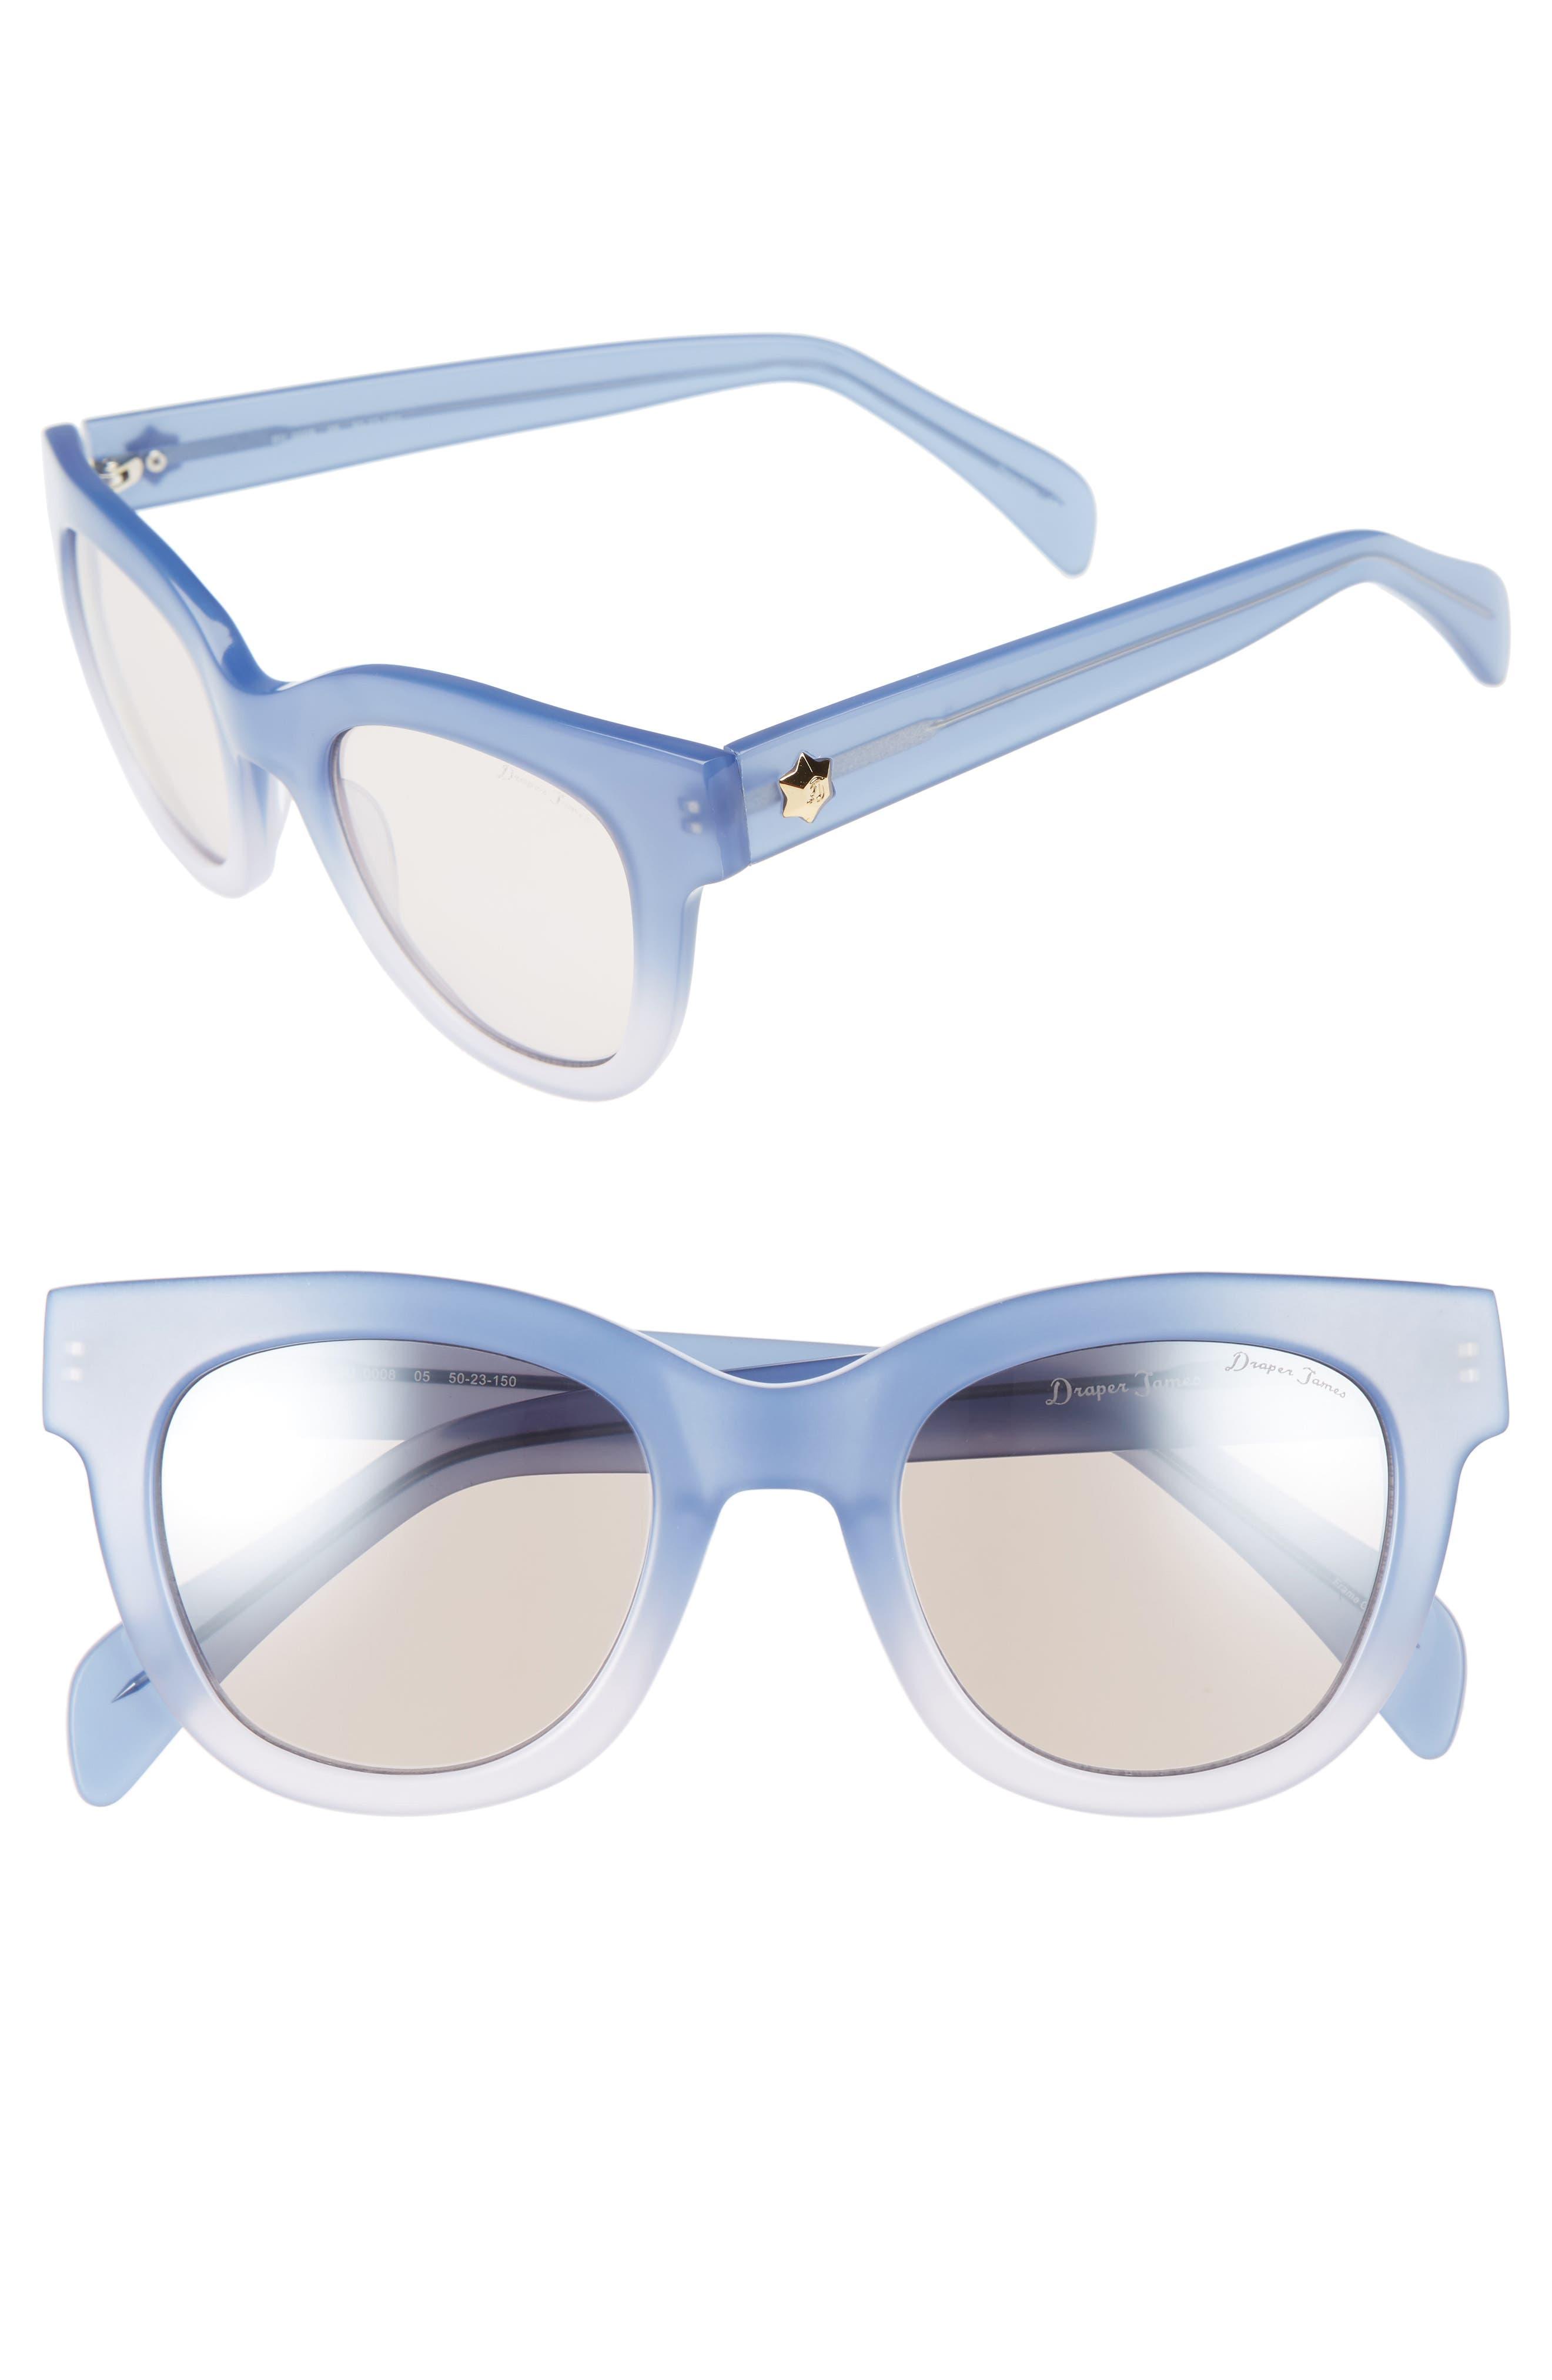 50mm Gradient Lens Cat Eye Sunglasses,                             Main thumbnail 1, color,                             Blue